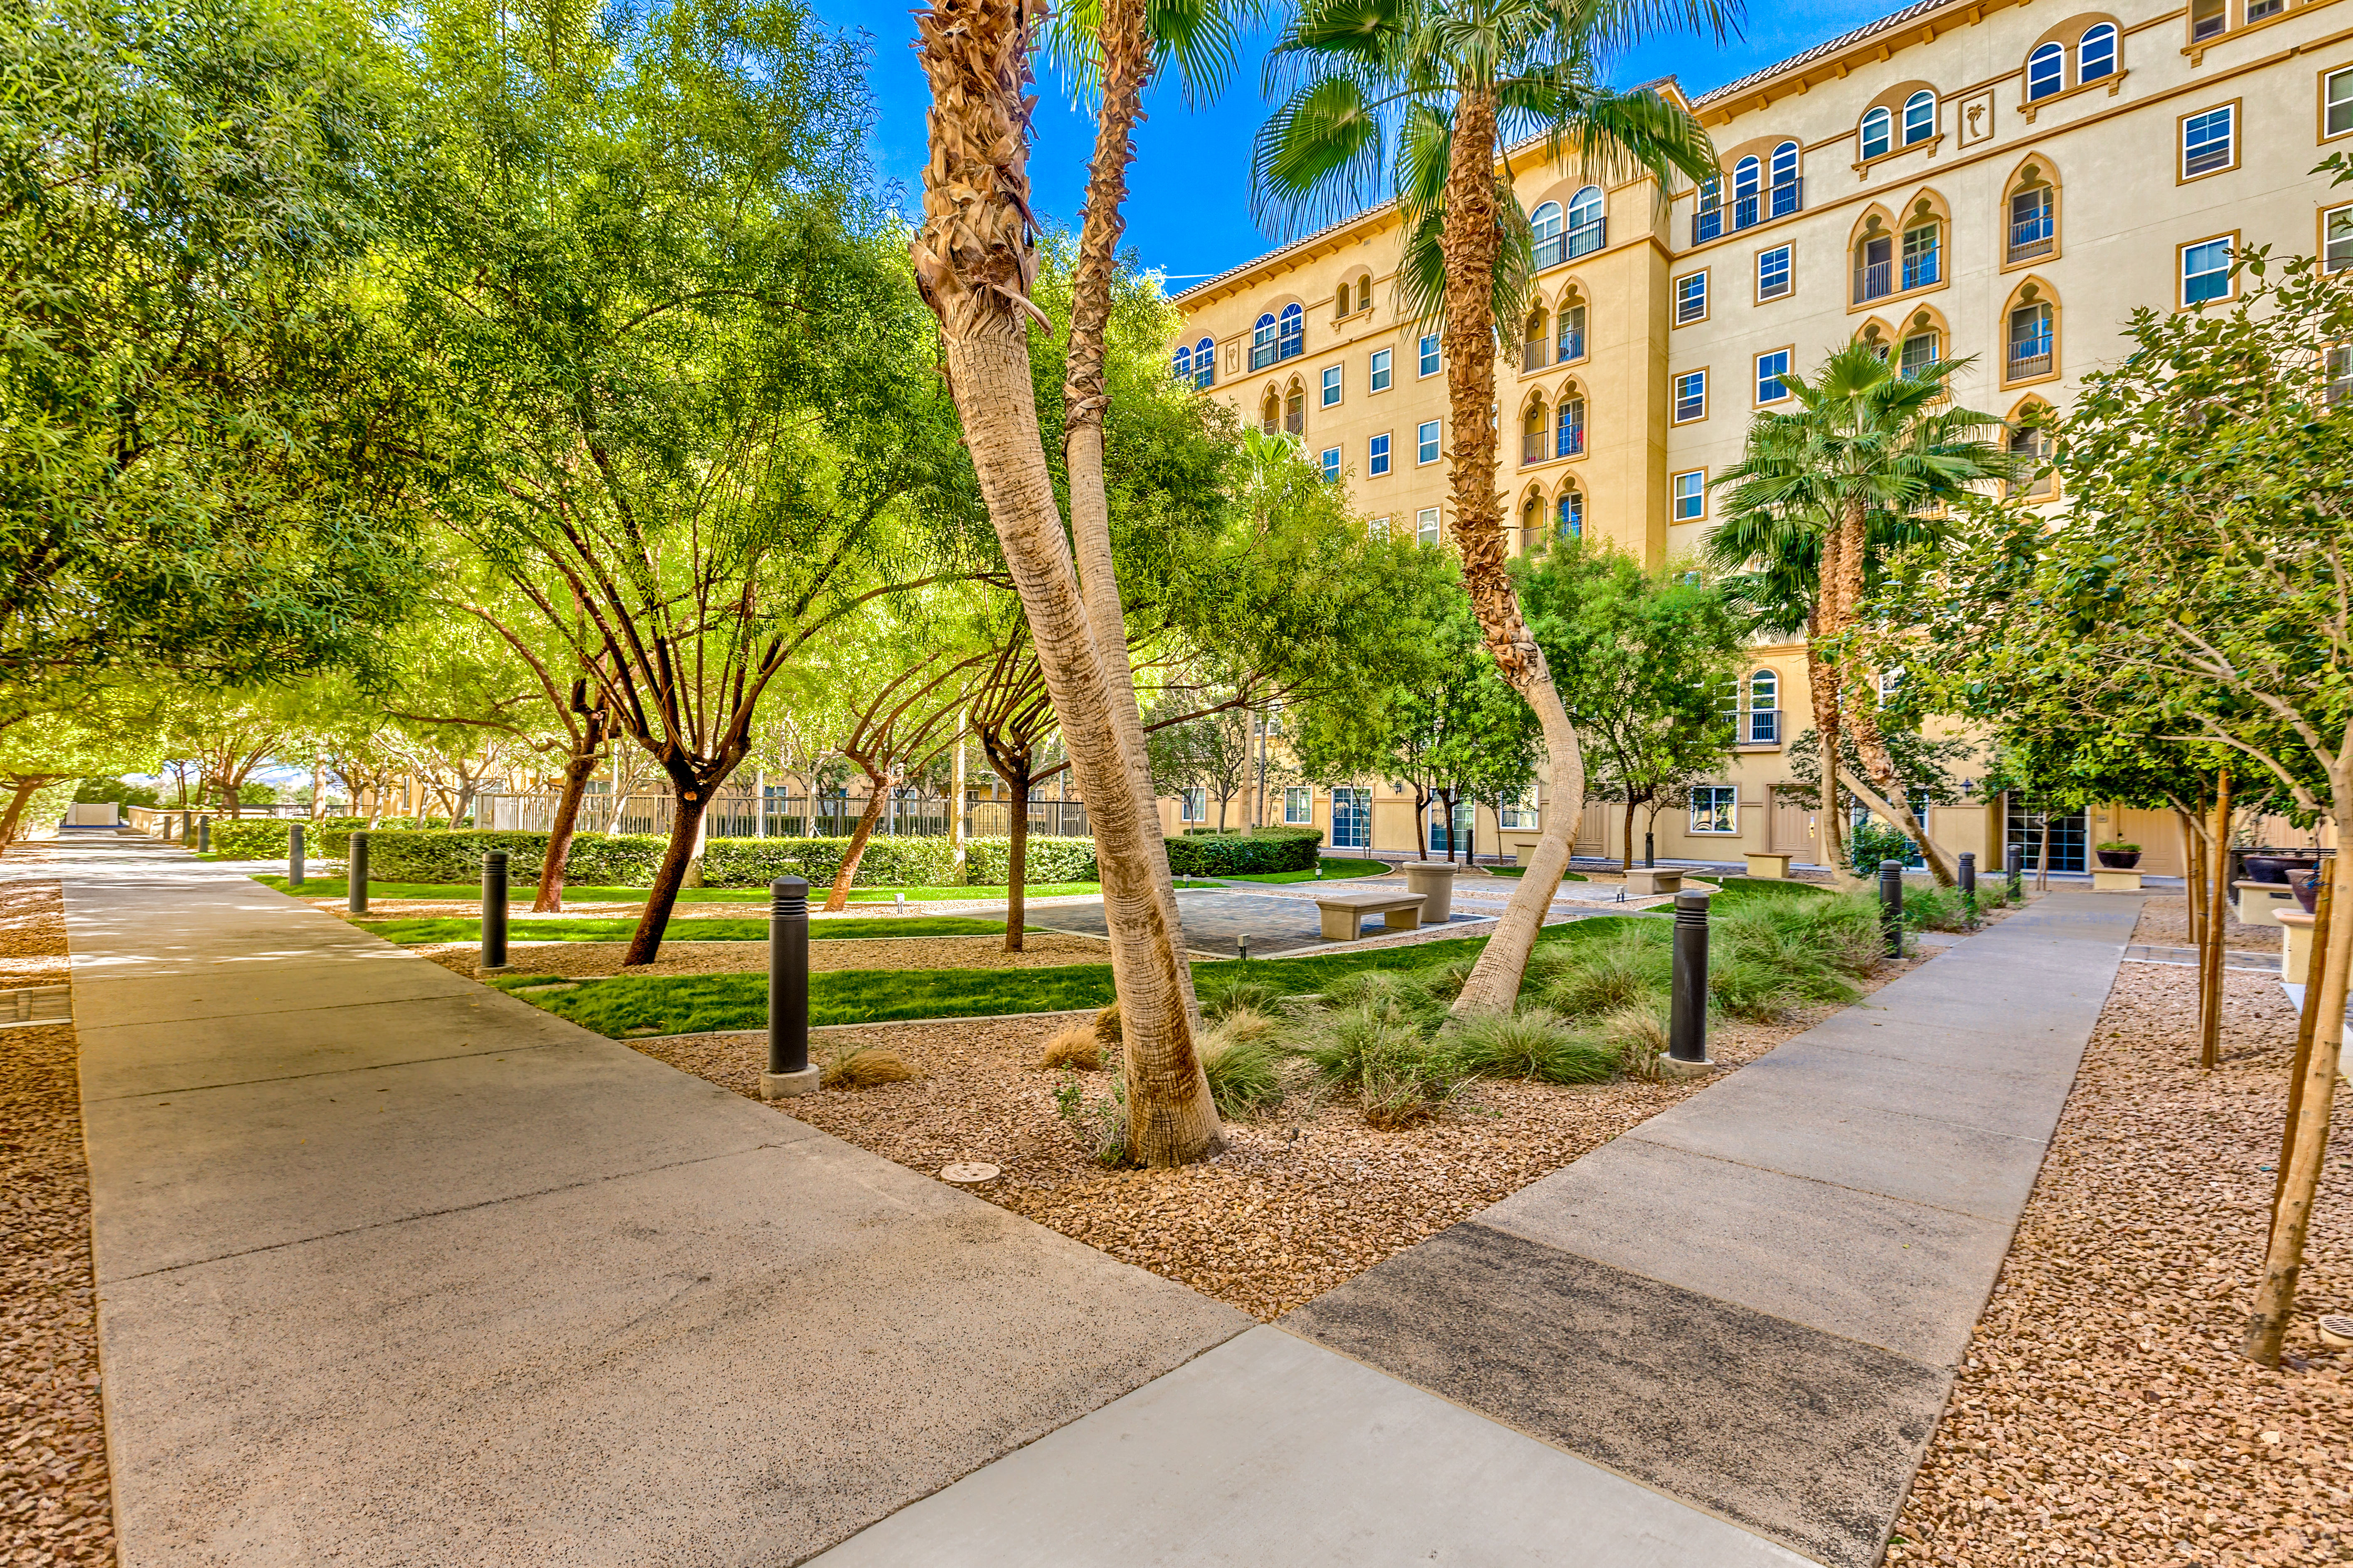 LAS VEGAS STRIP Condos, Lofts and - Las Vegas Condo Mania